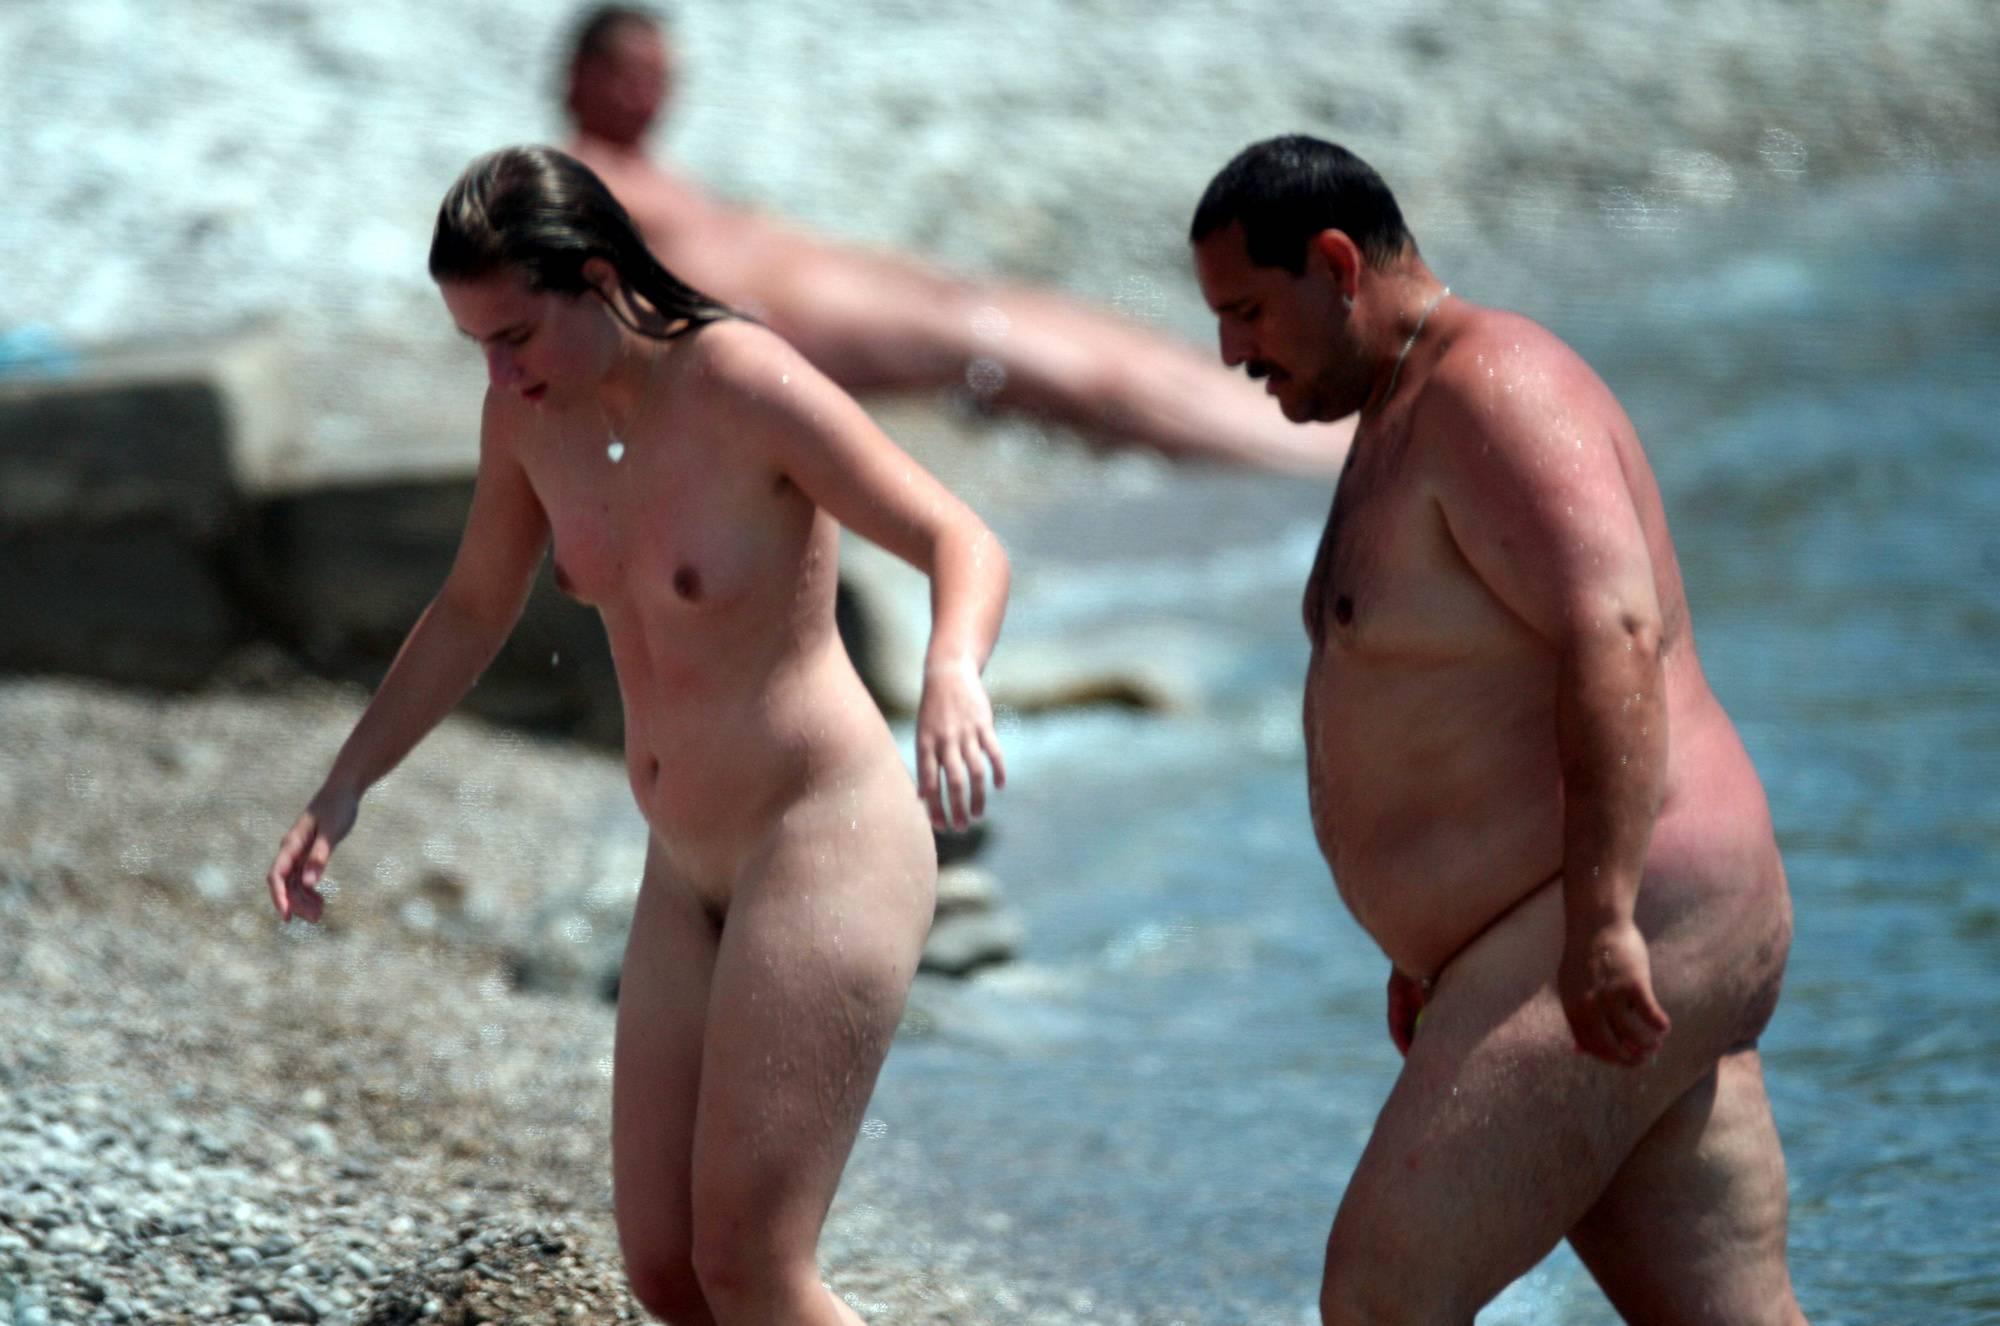 Pure Nudism Photos-Dad- Daughter Beach Trip - 3